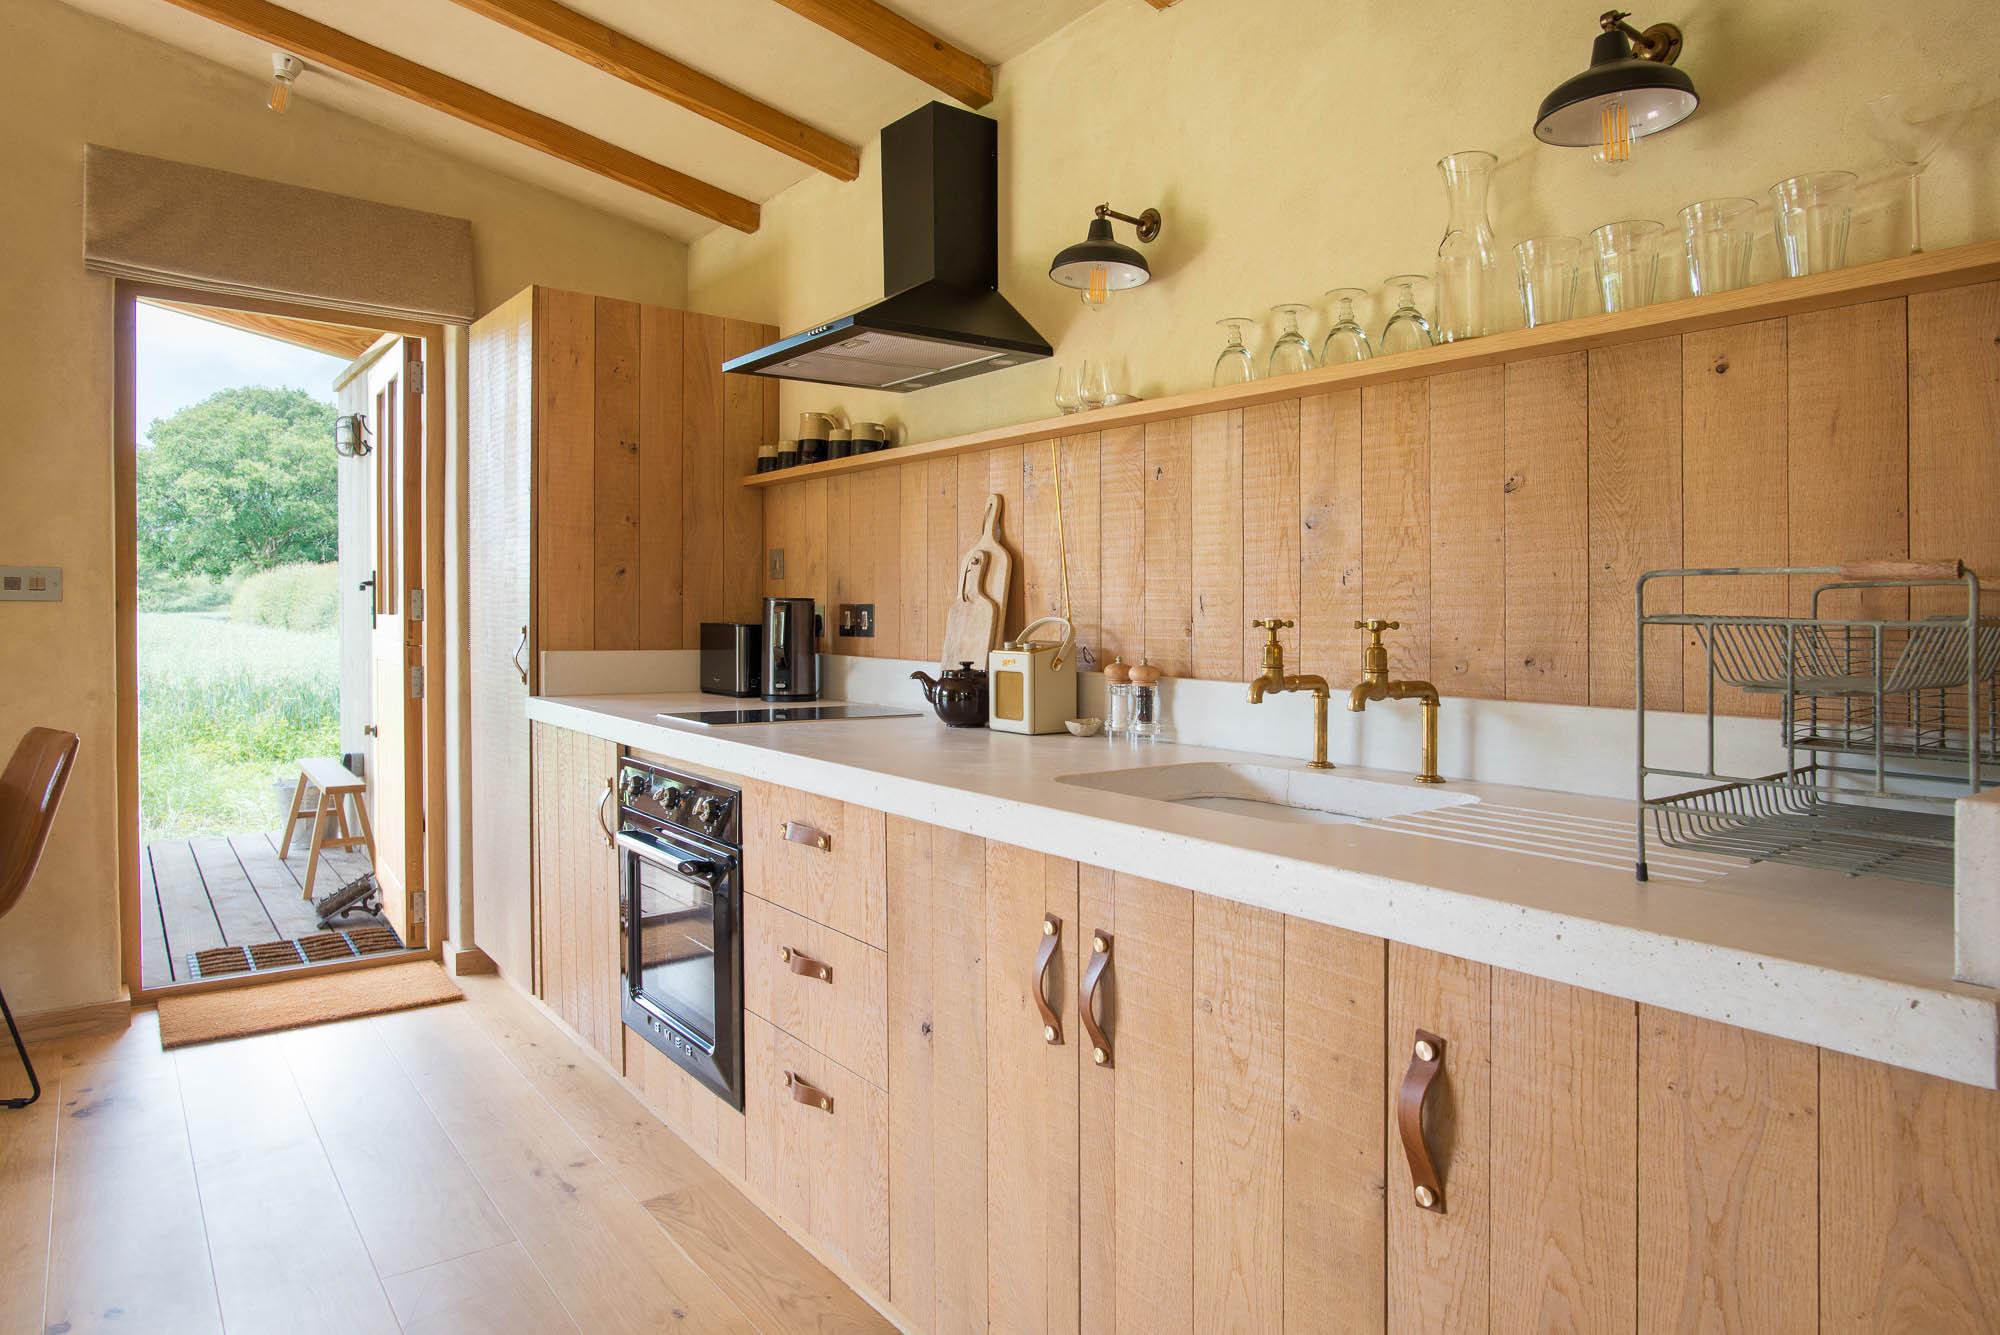 off-grid cabin interior, oak kitchen and concrete worktop, copper taps and digital radio